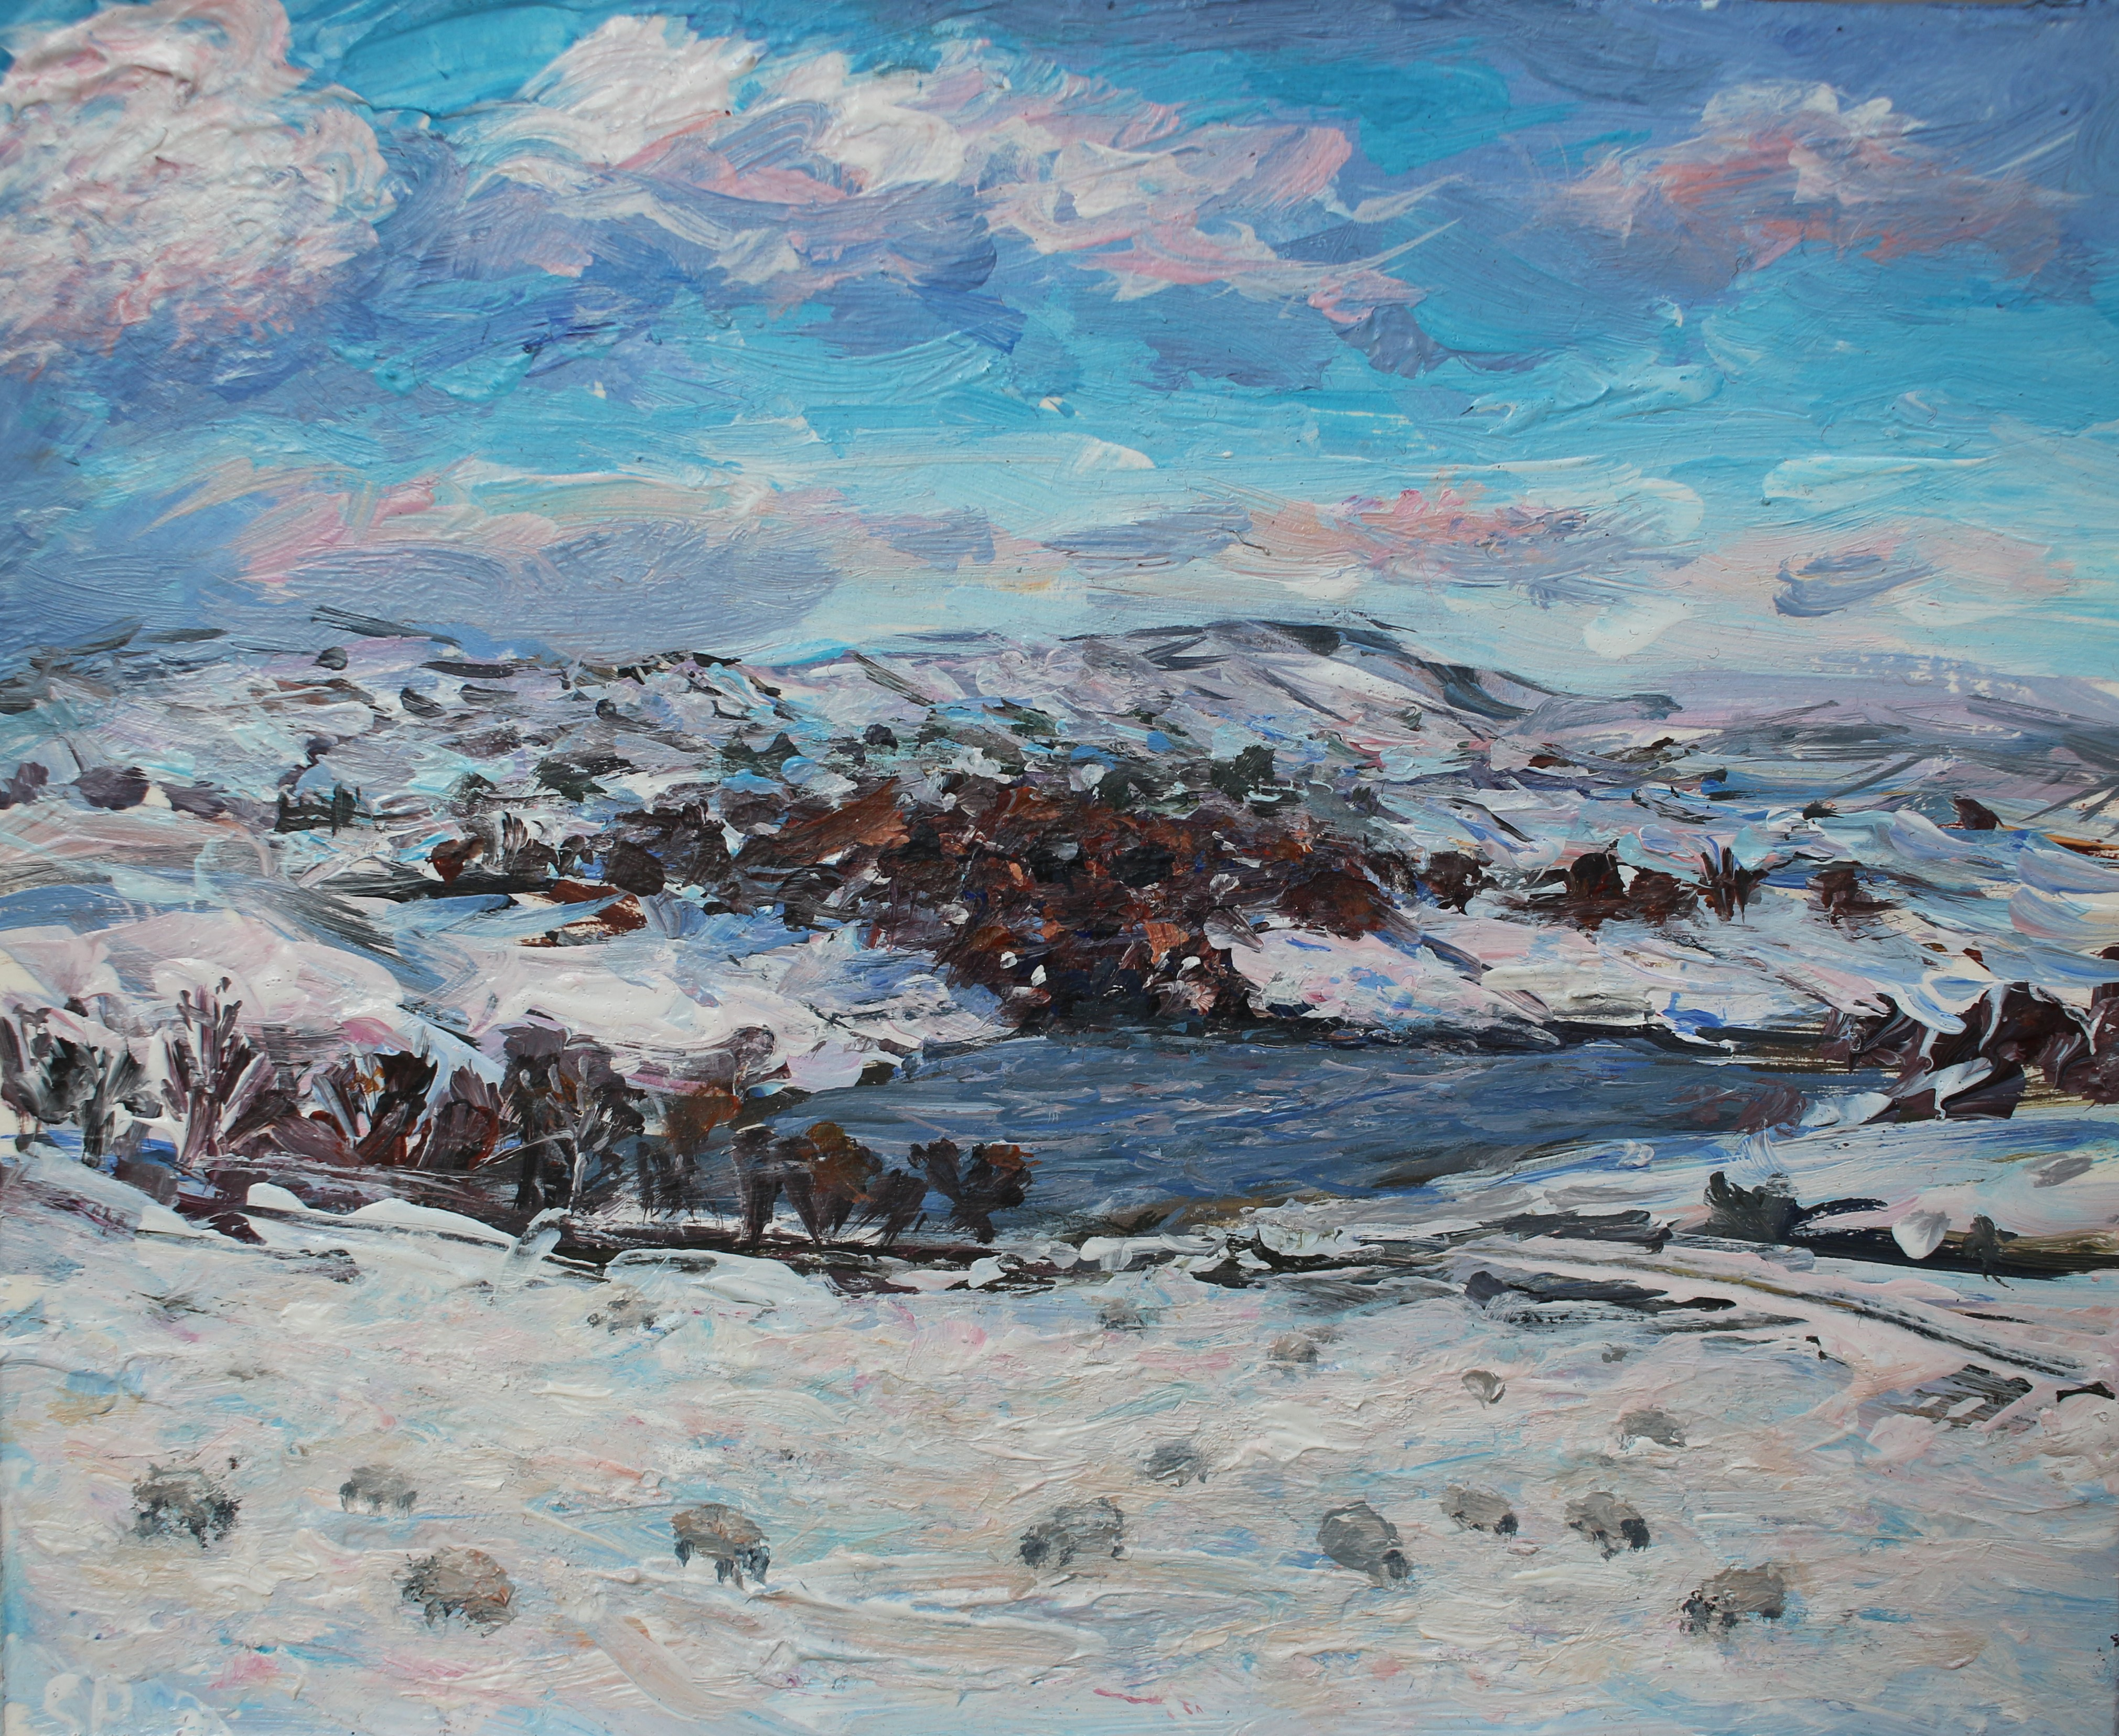 Snowy Swinshaw reservoir